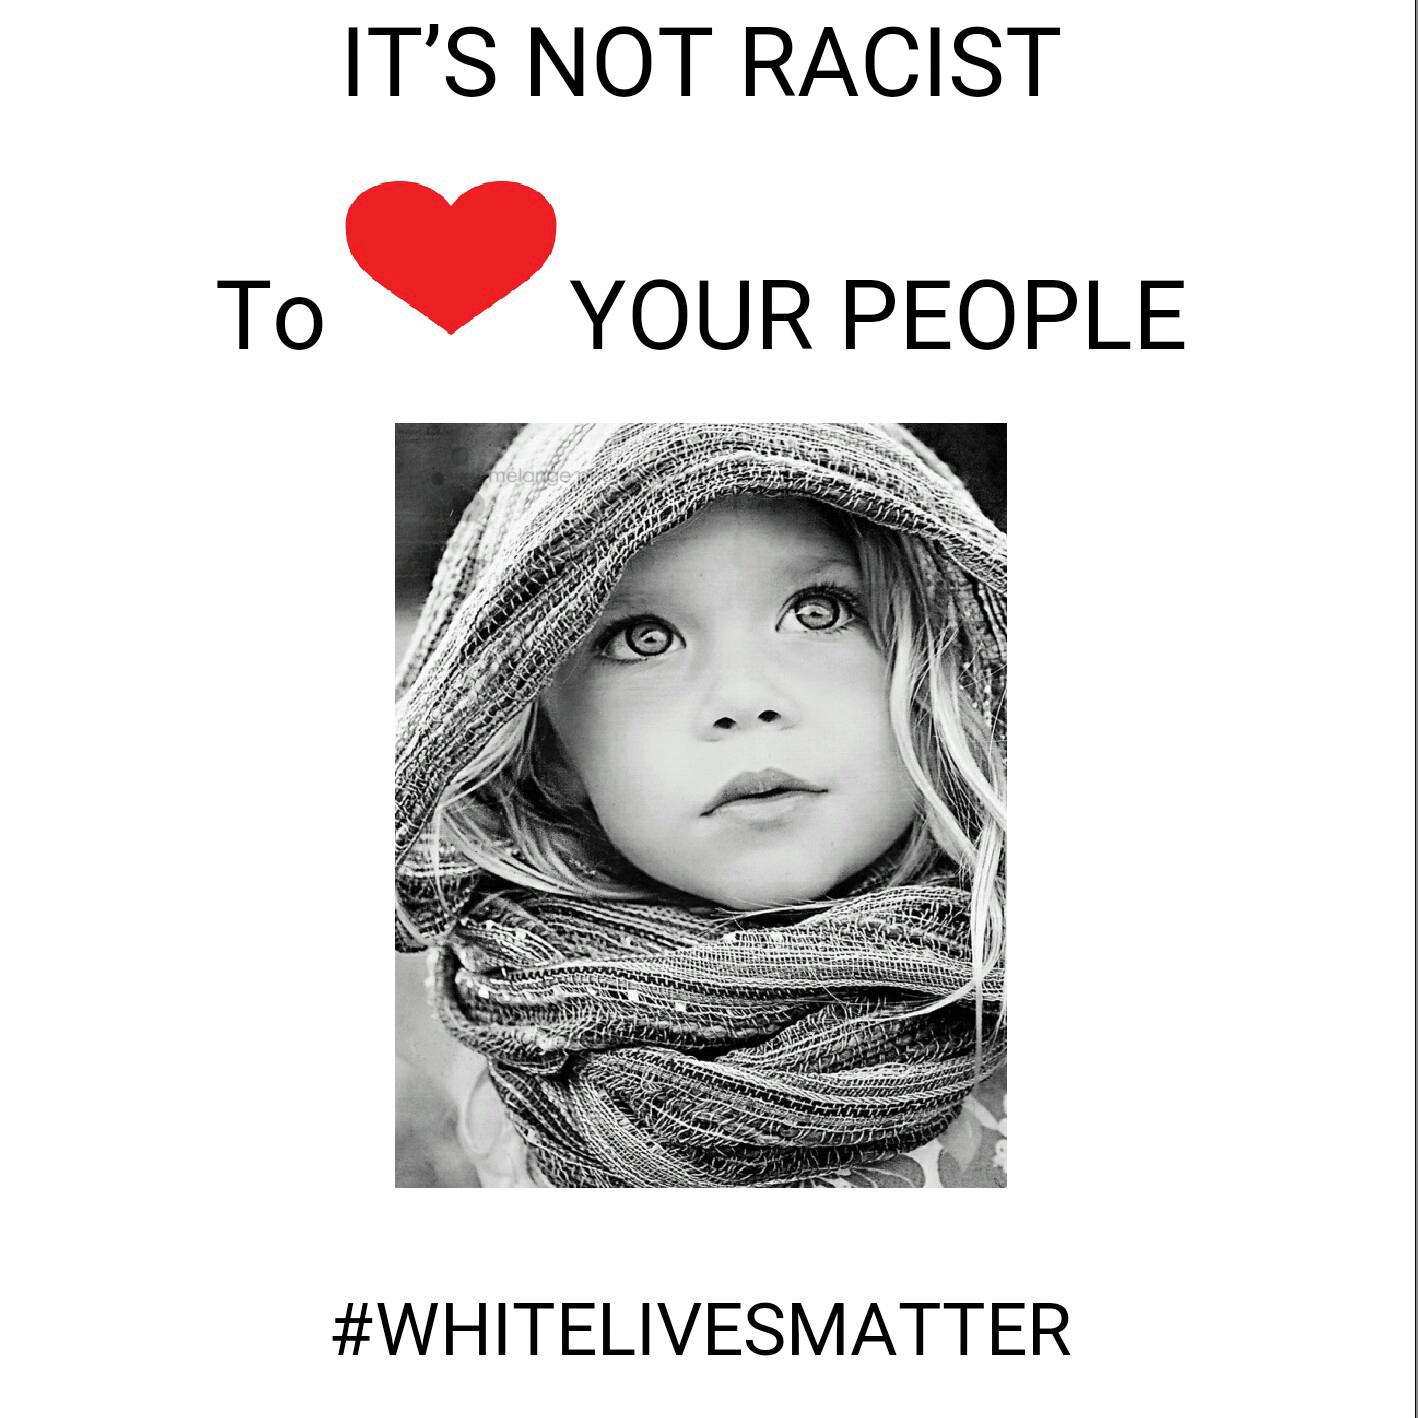 ir161-white-lives-matter_sign.png